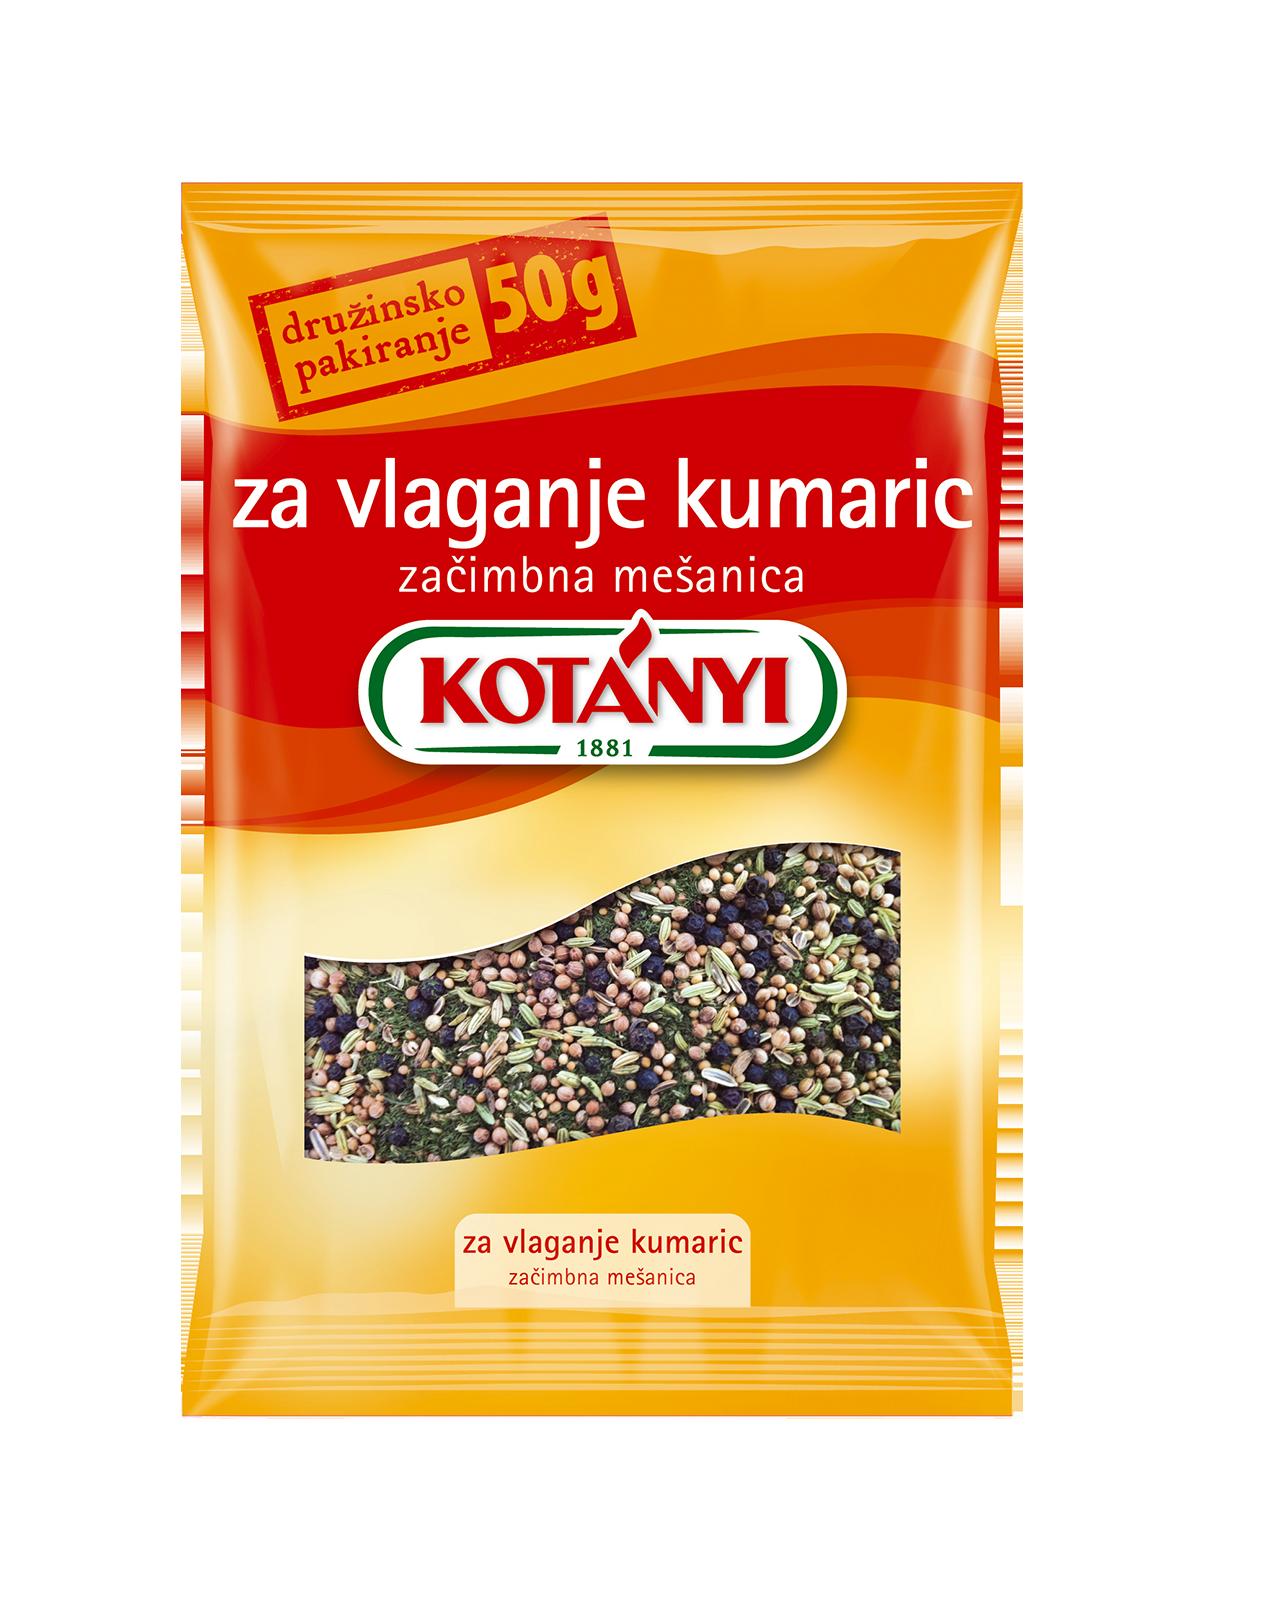 079706 Kotanyi Za Vlaganje Kumaric B2c Pouch